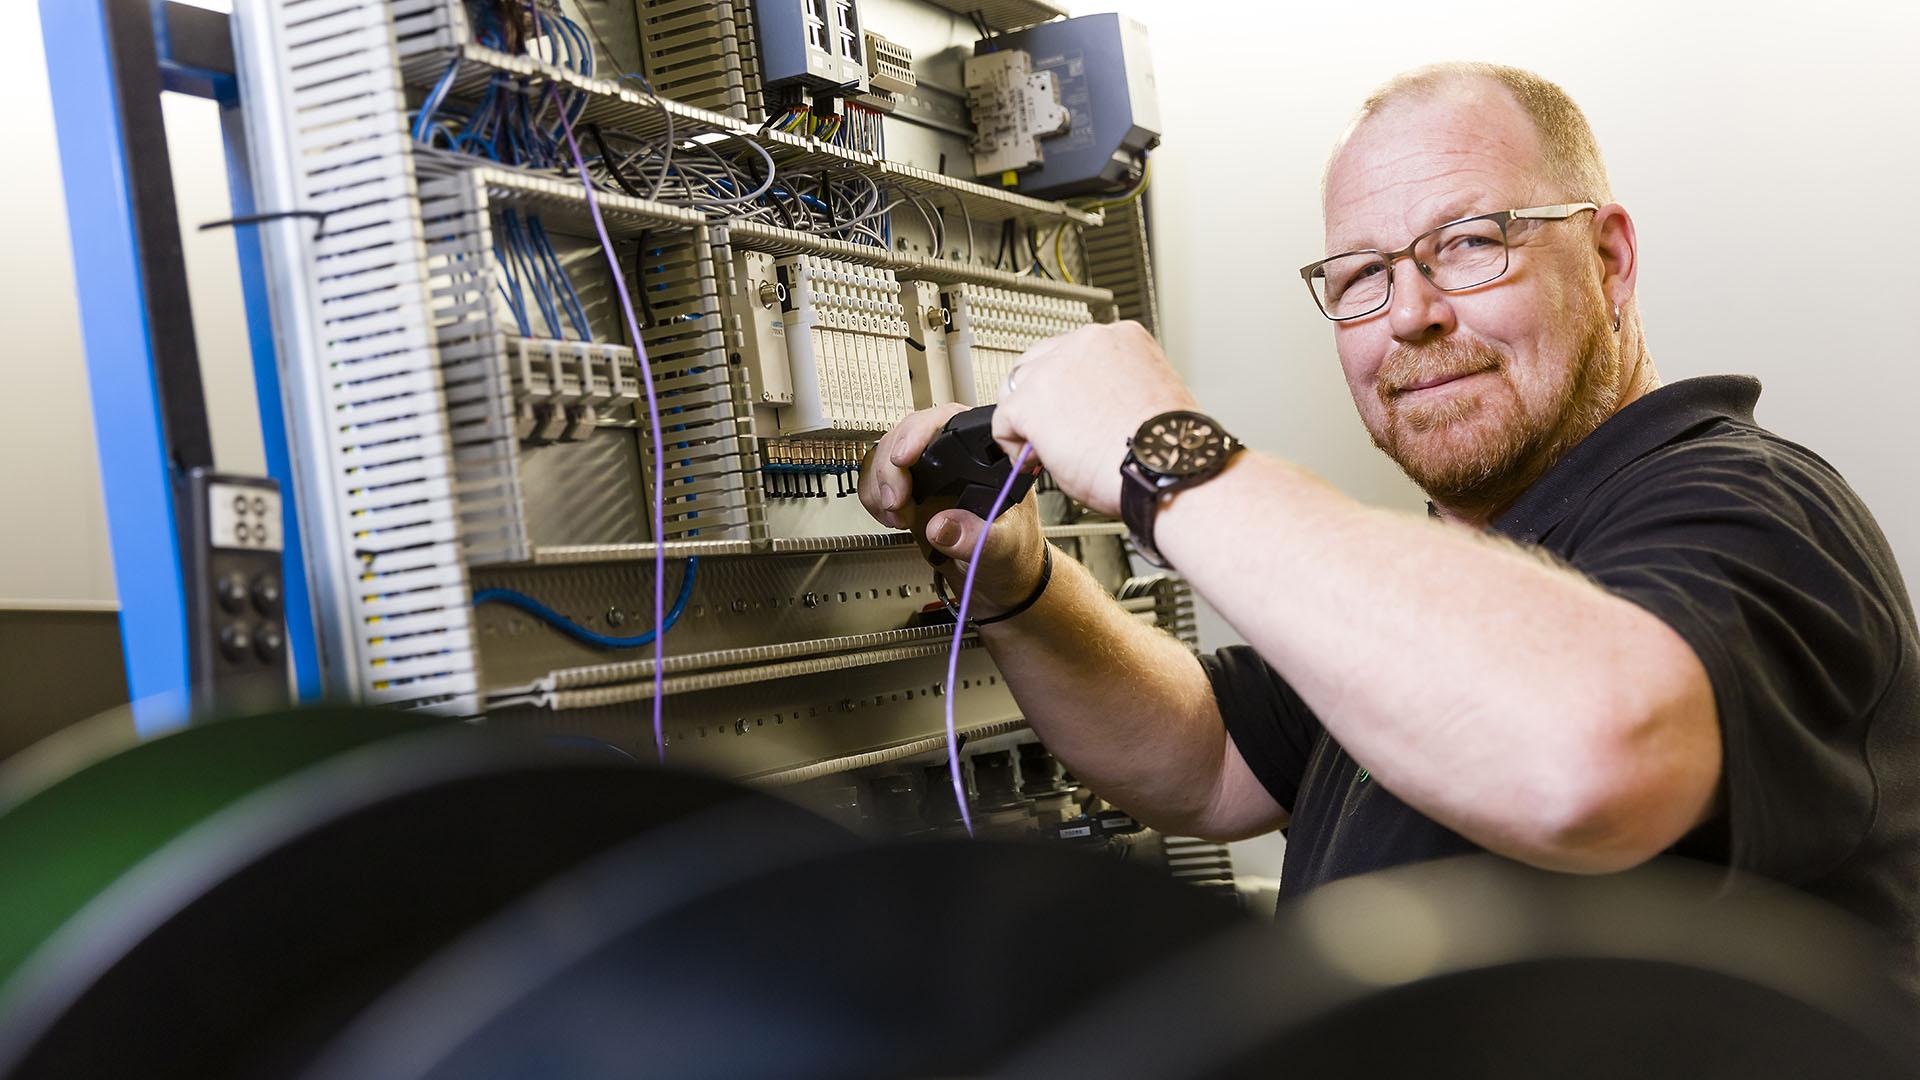 Mechatronics Technician